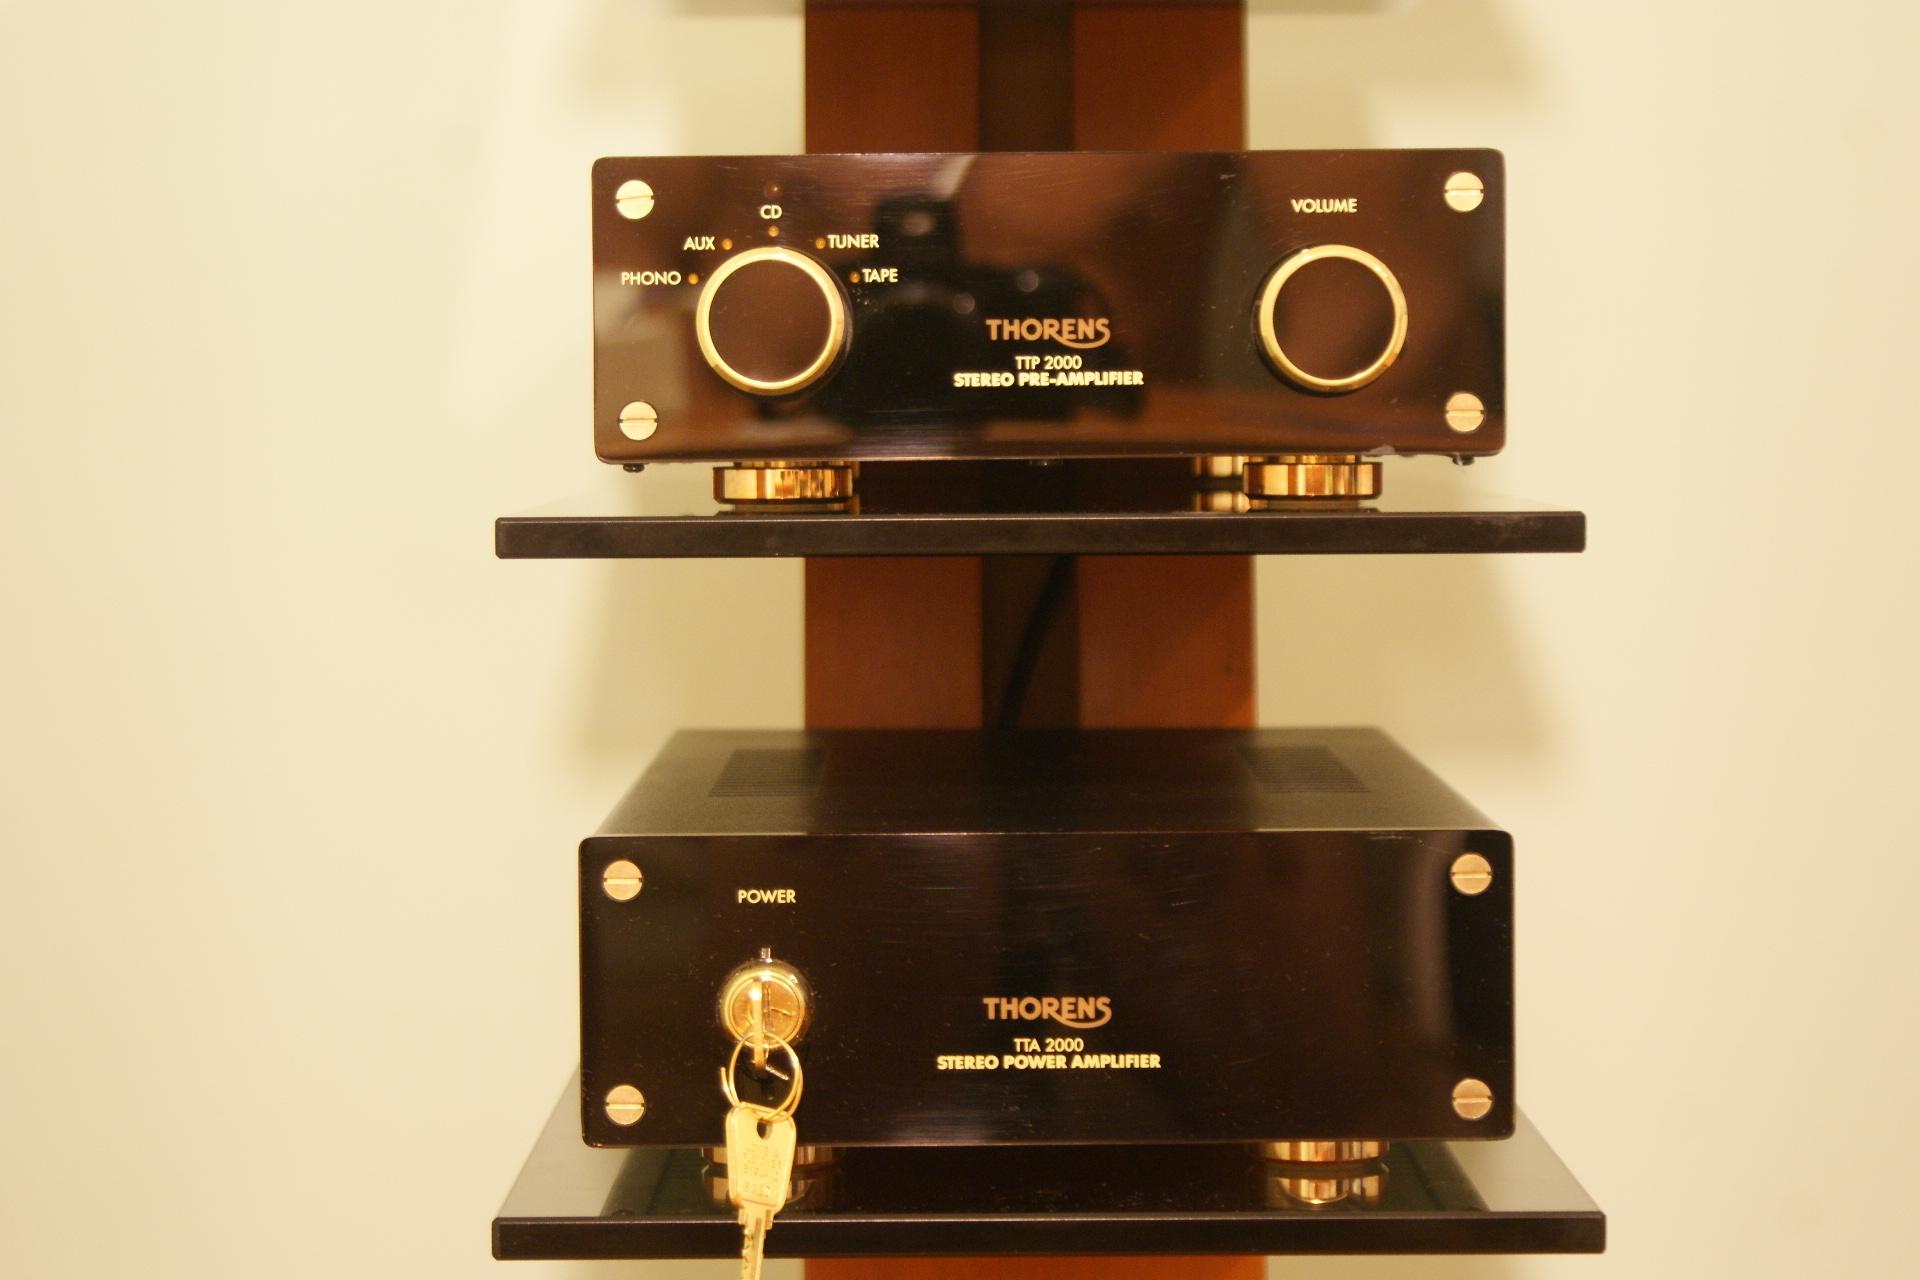 Hitachi Sdt-900 Stereo 98688ad4ae220c0fc031cfa964c13e89